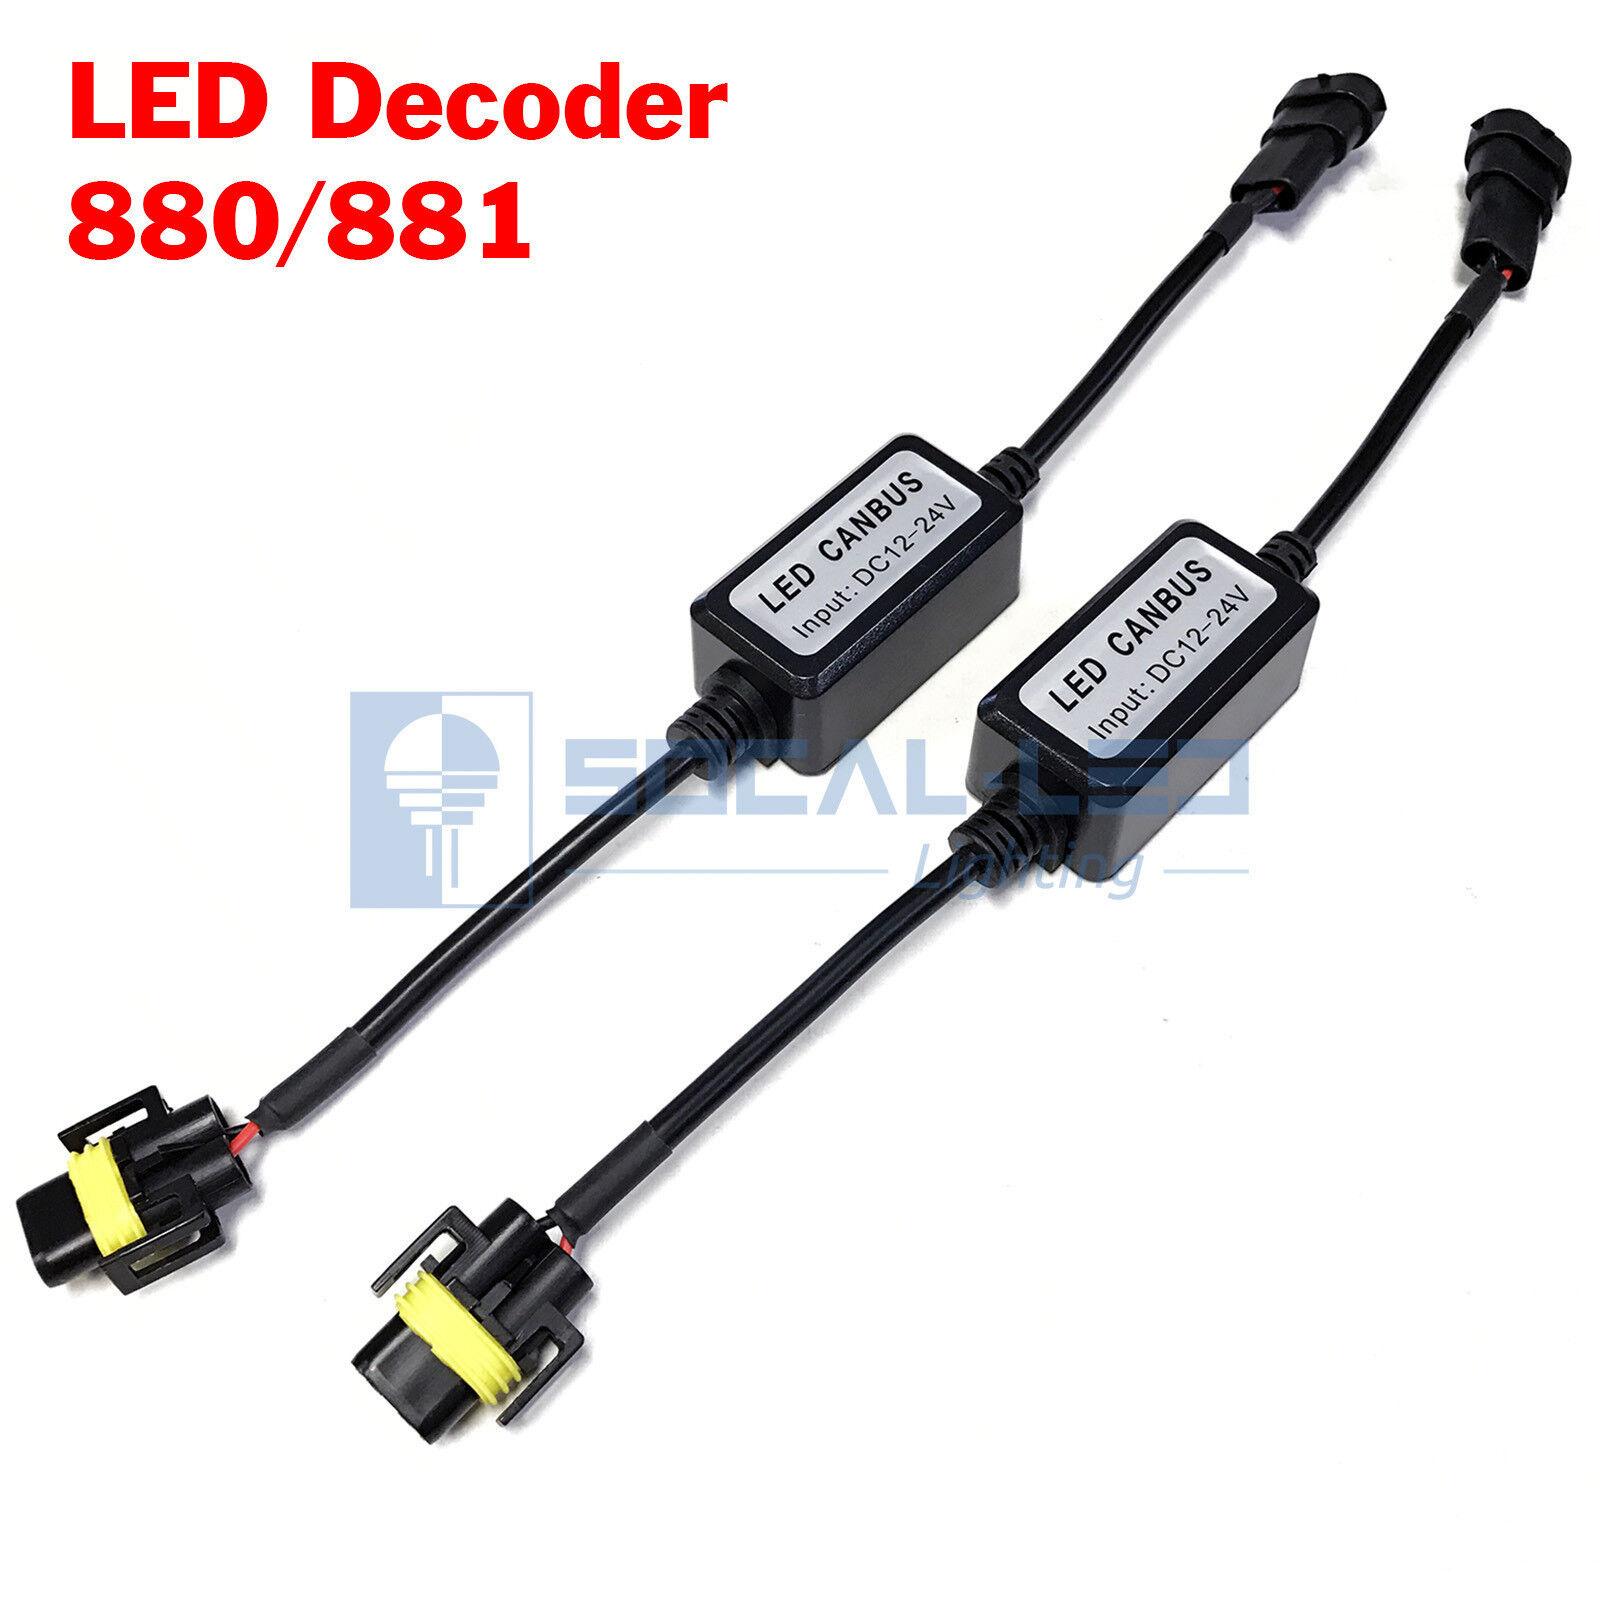 64 custom 880 wiring harness wiring schematics diagram64 custom 880 wiring harness wiring library custom lighting 2x emc 880 881 fog light kit